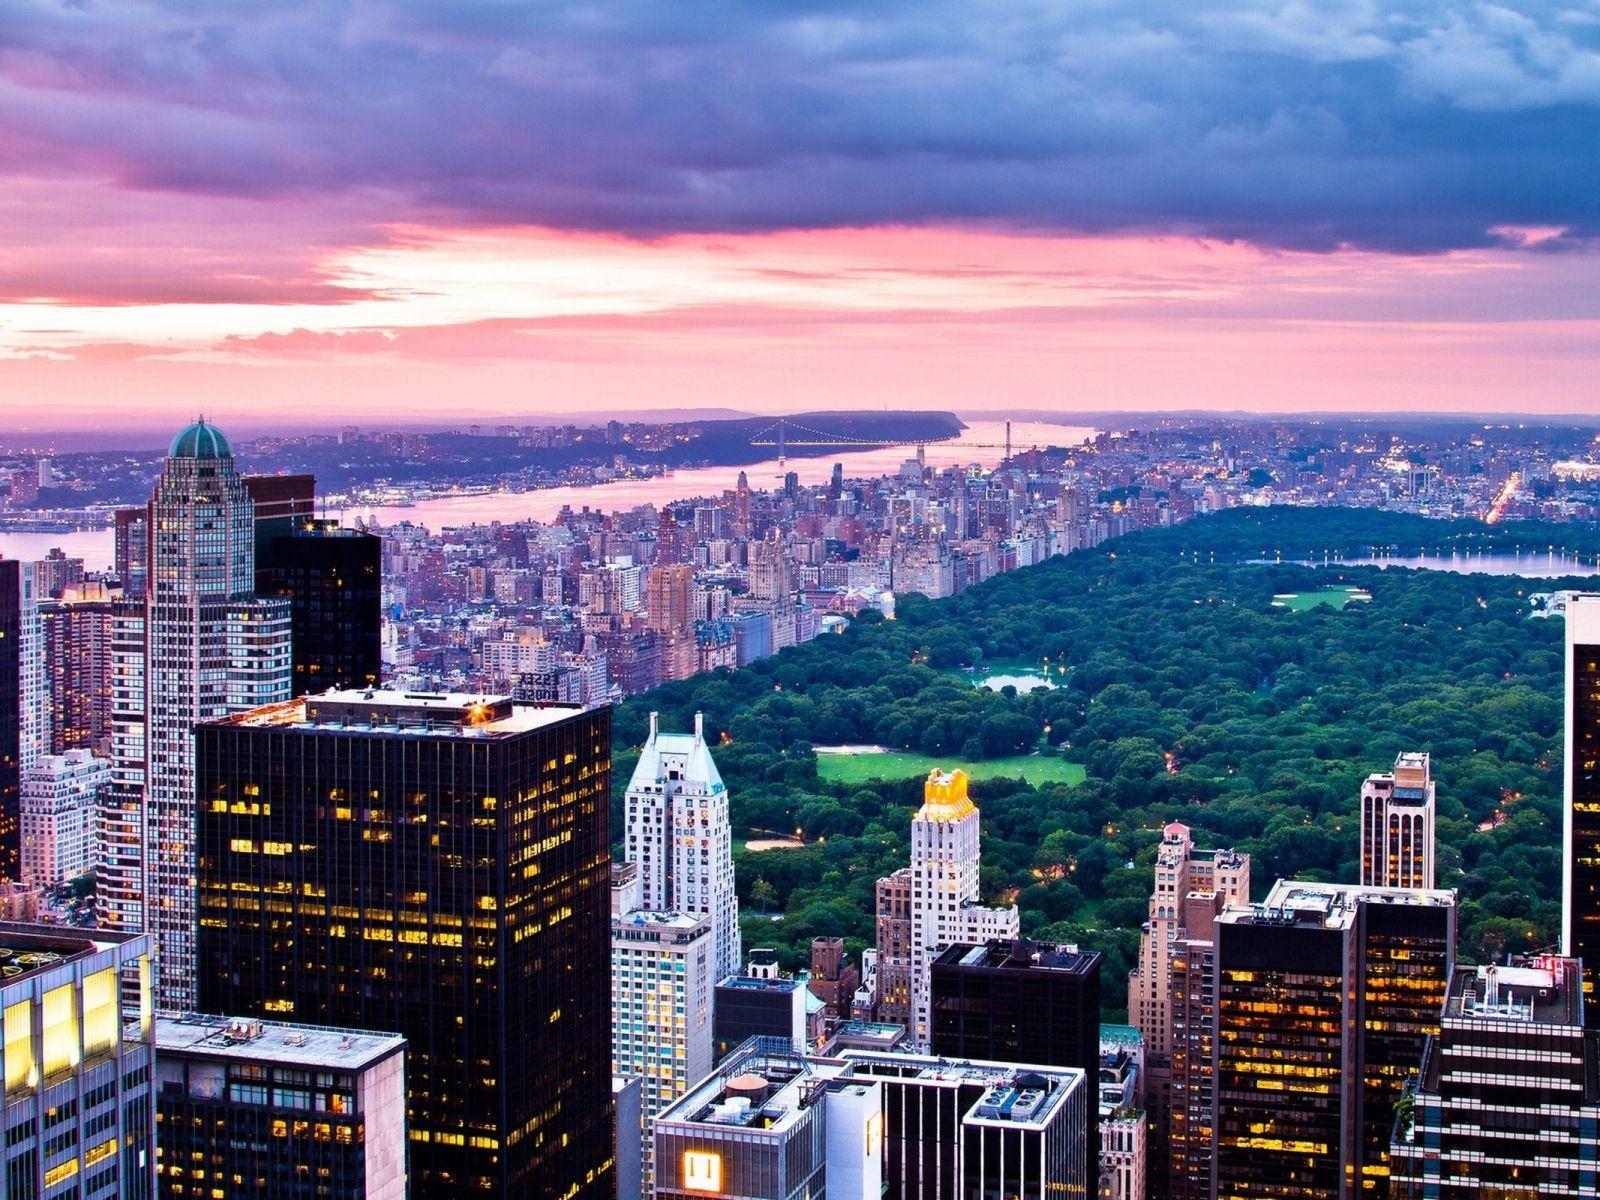 New York City Overview Wallpaper